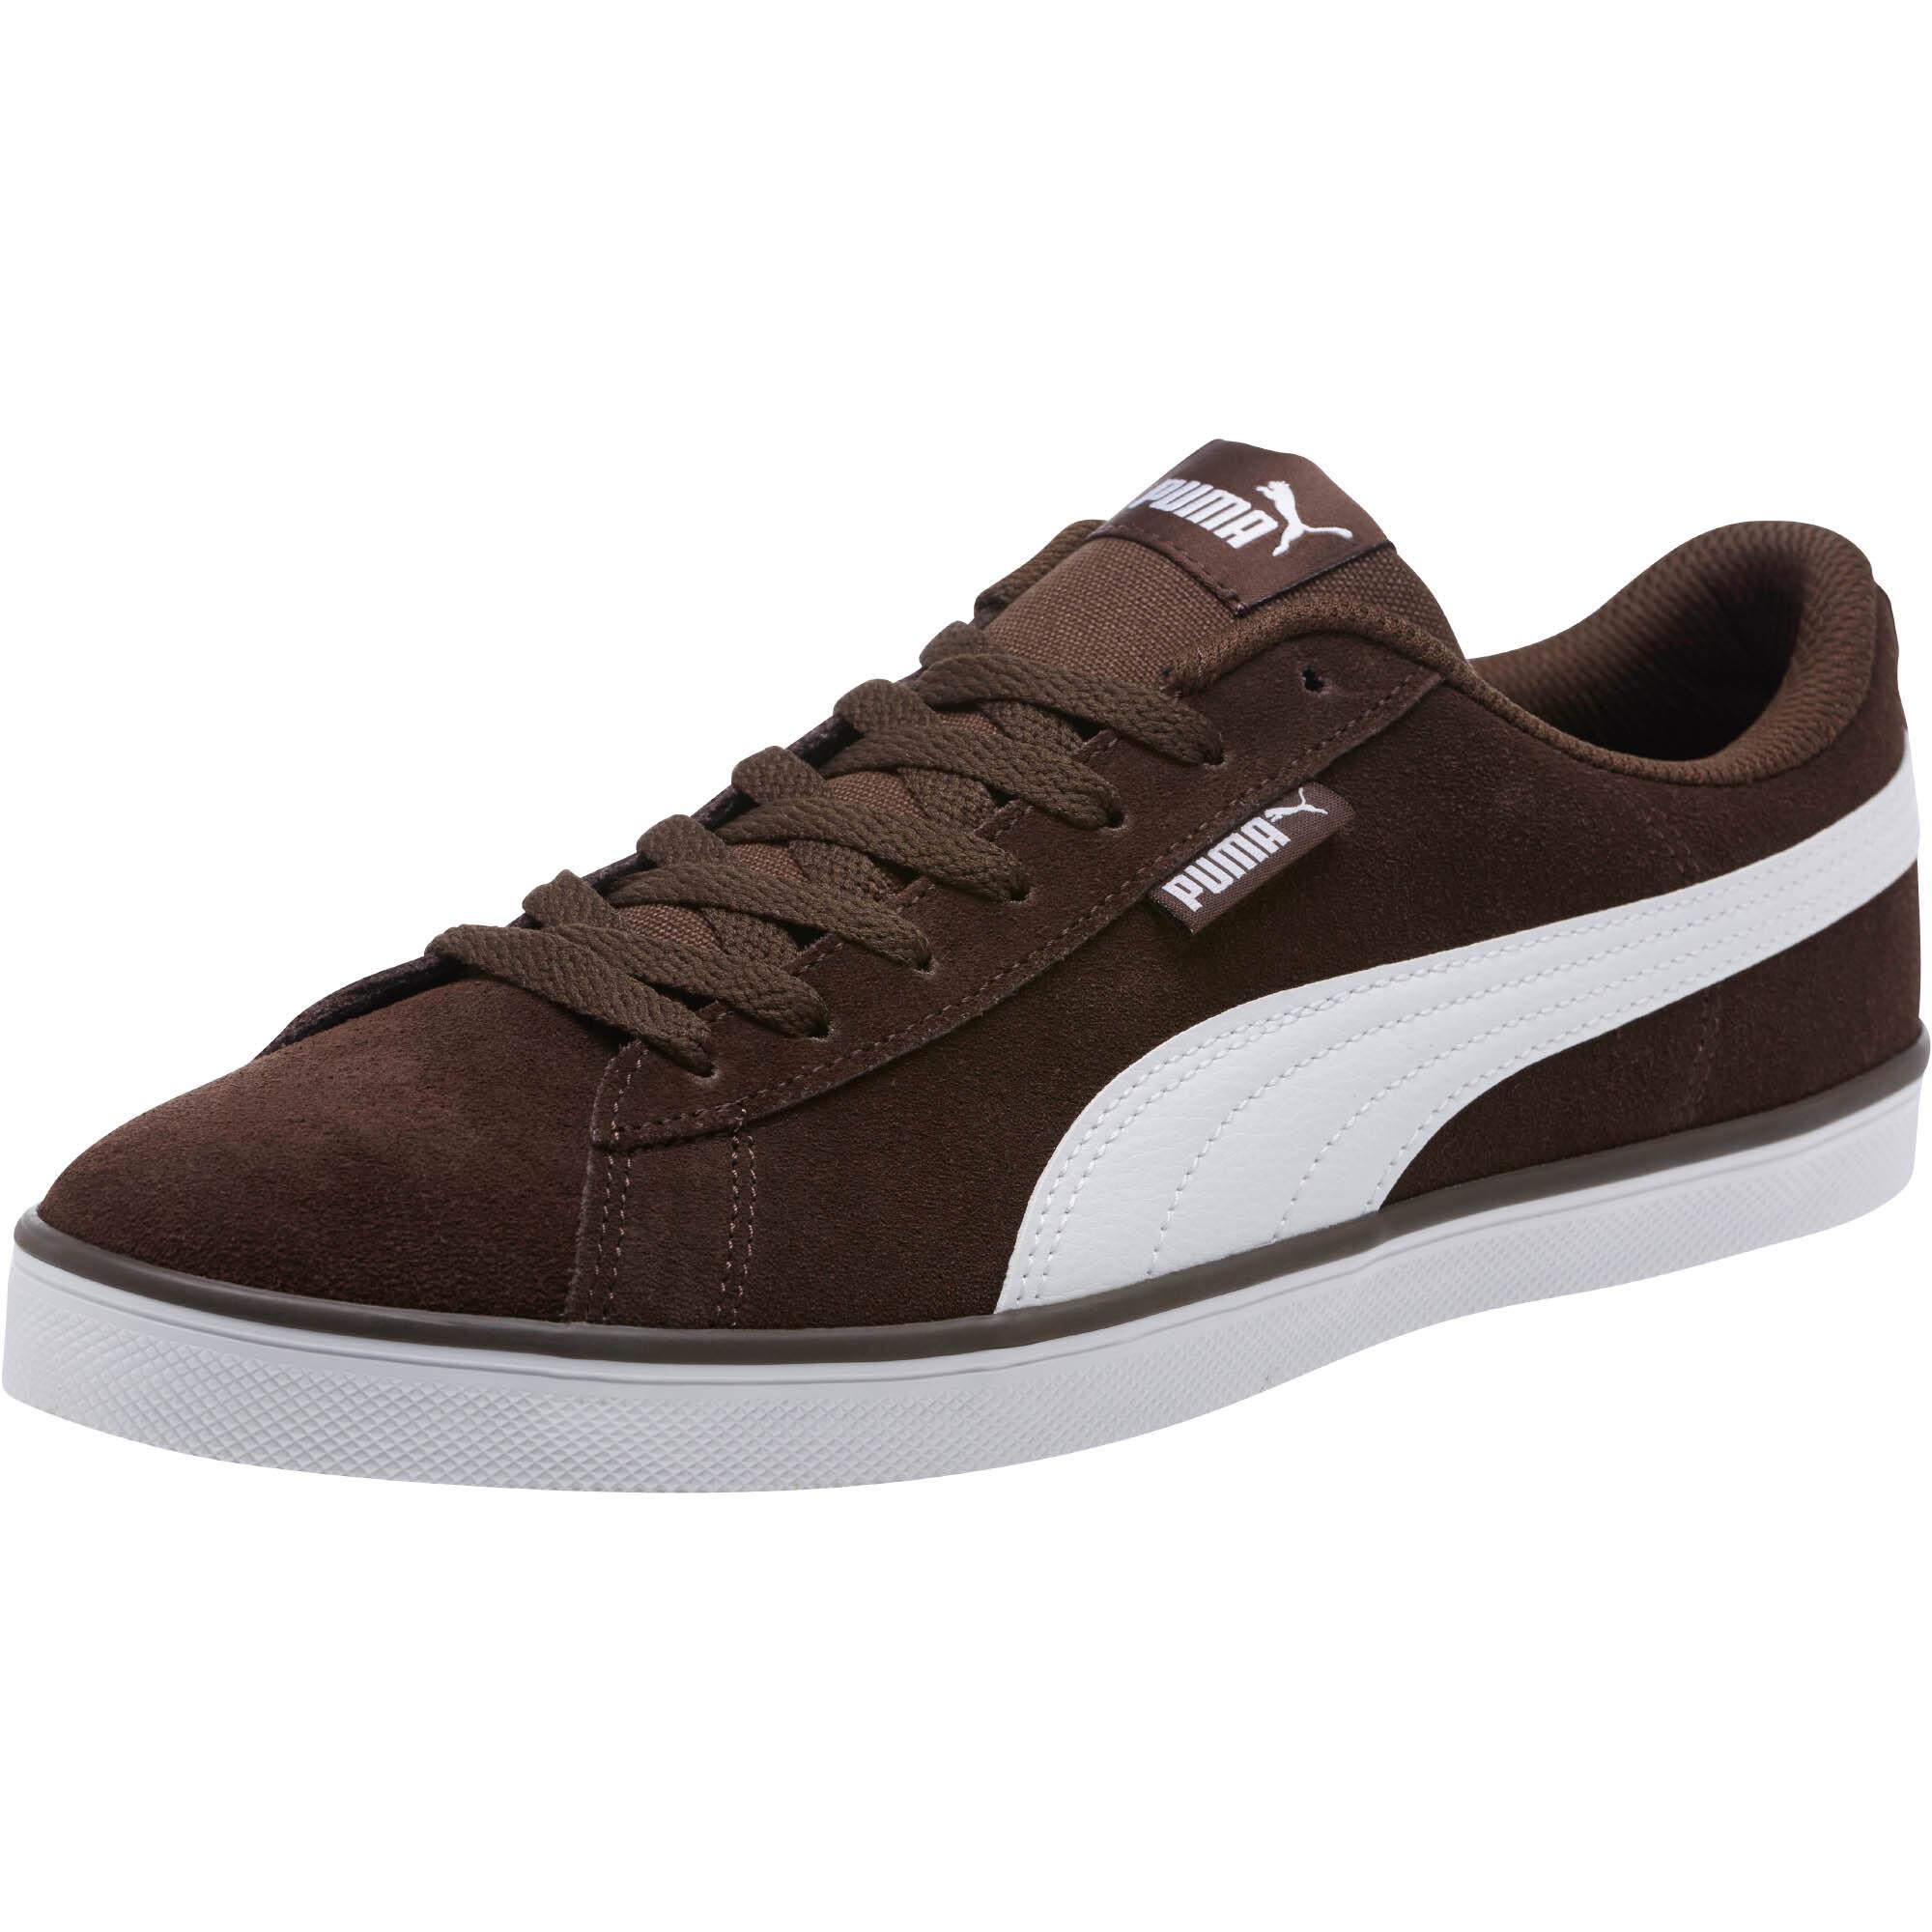 PUMA-Urban-Plus-Suede-Sneakers-Men-Shoe-Basics thumbnail 3